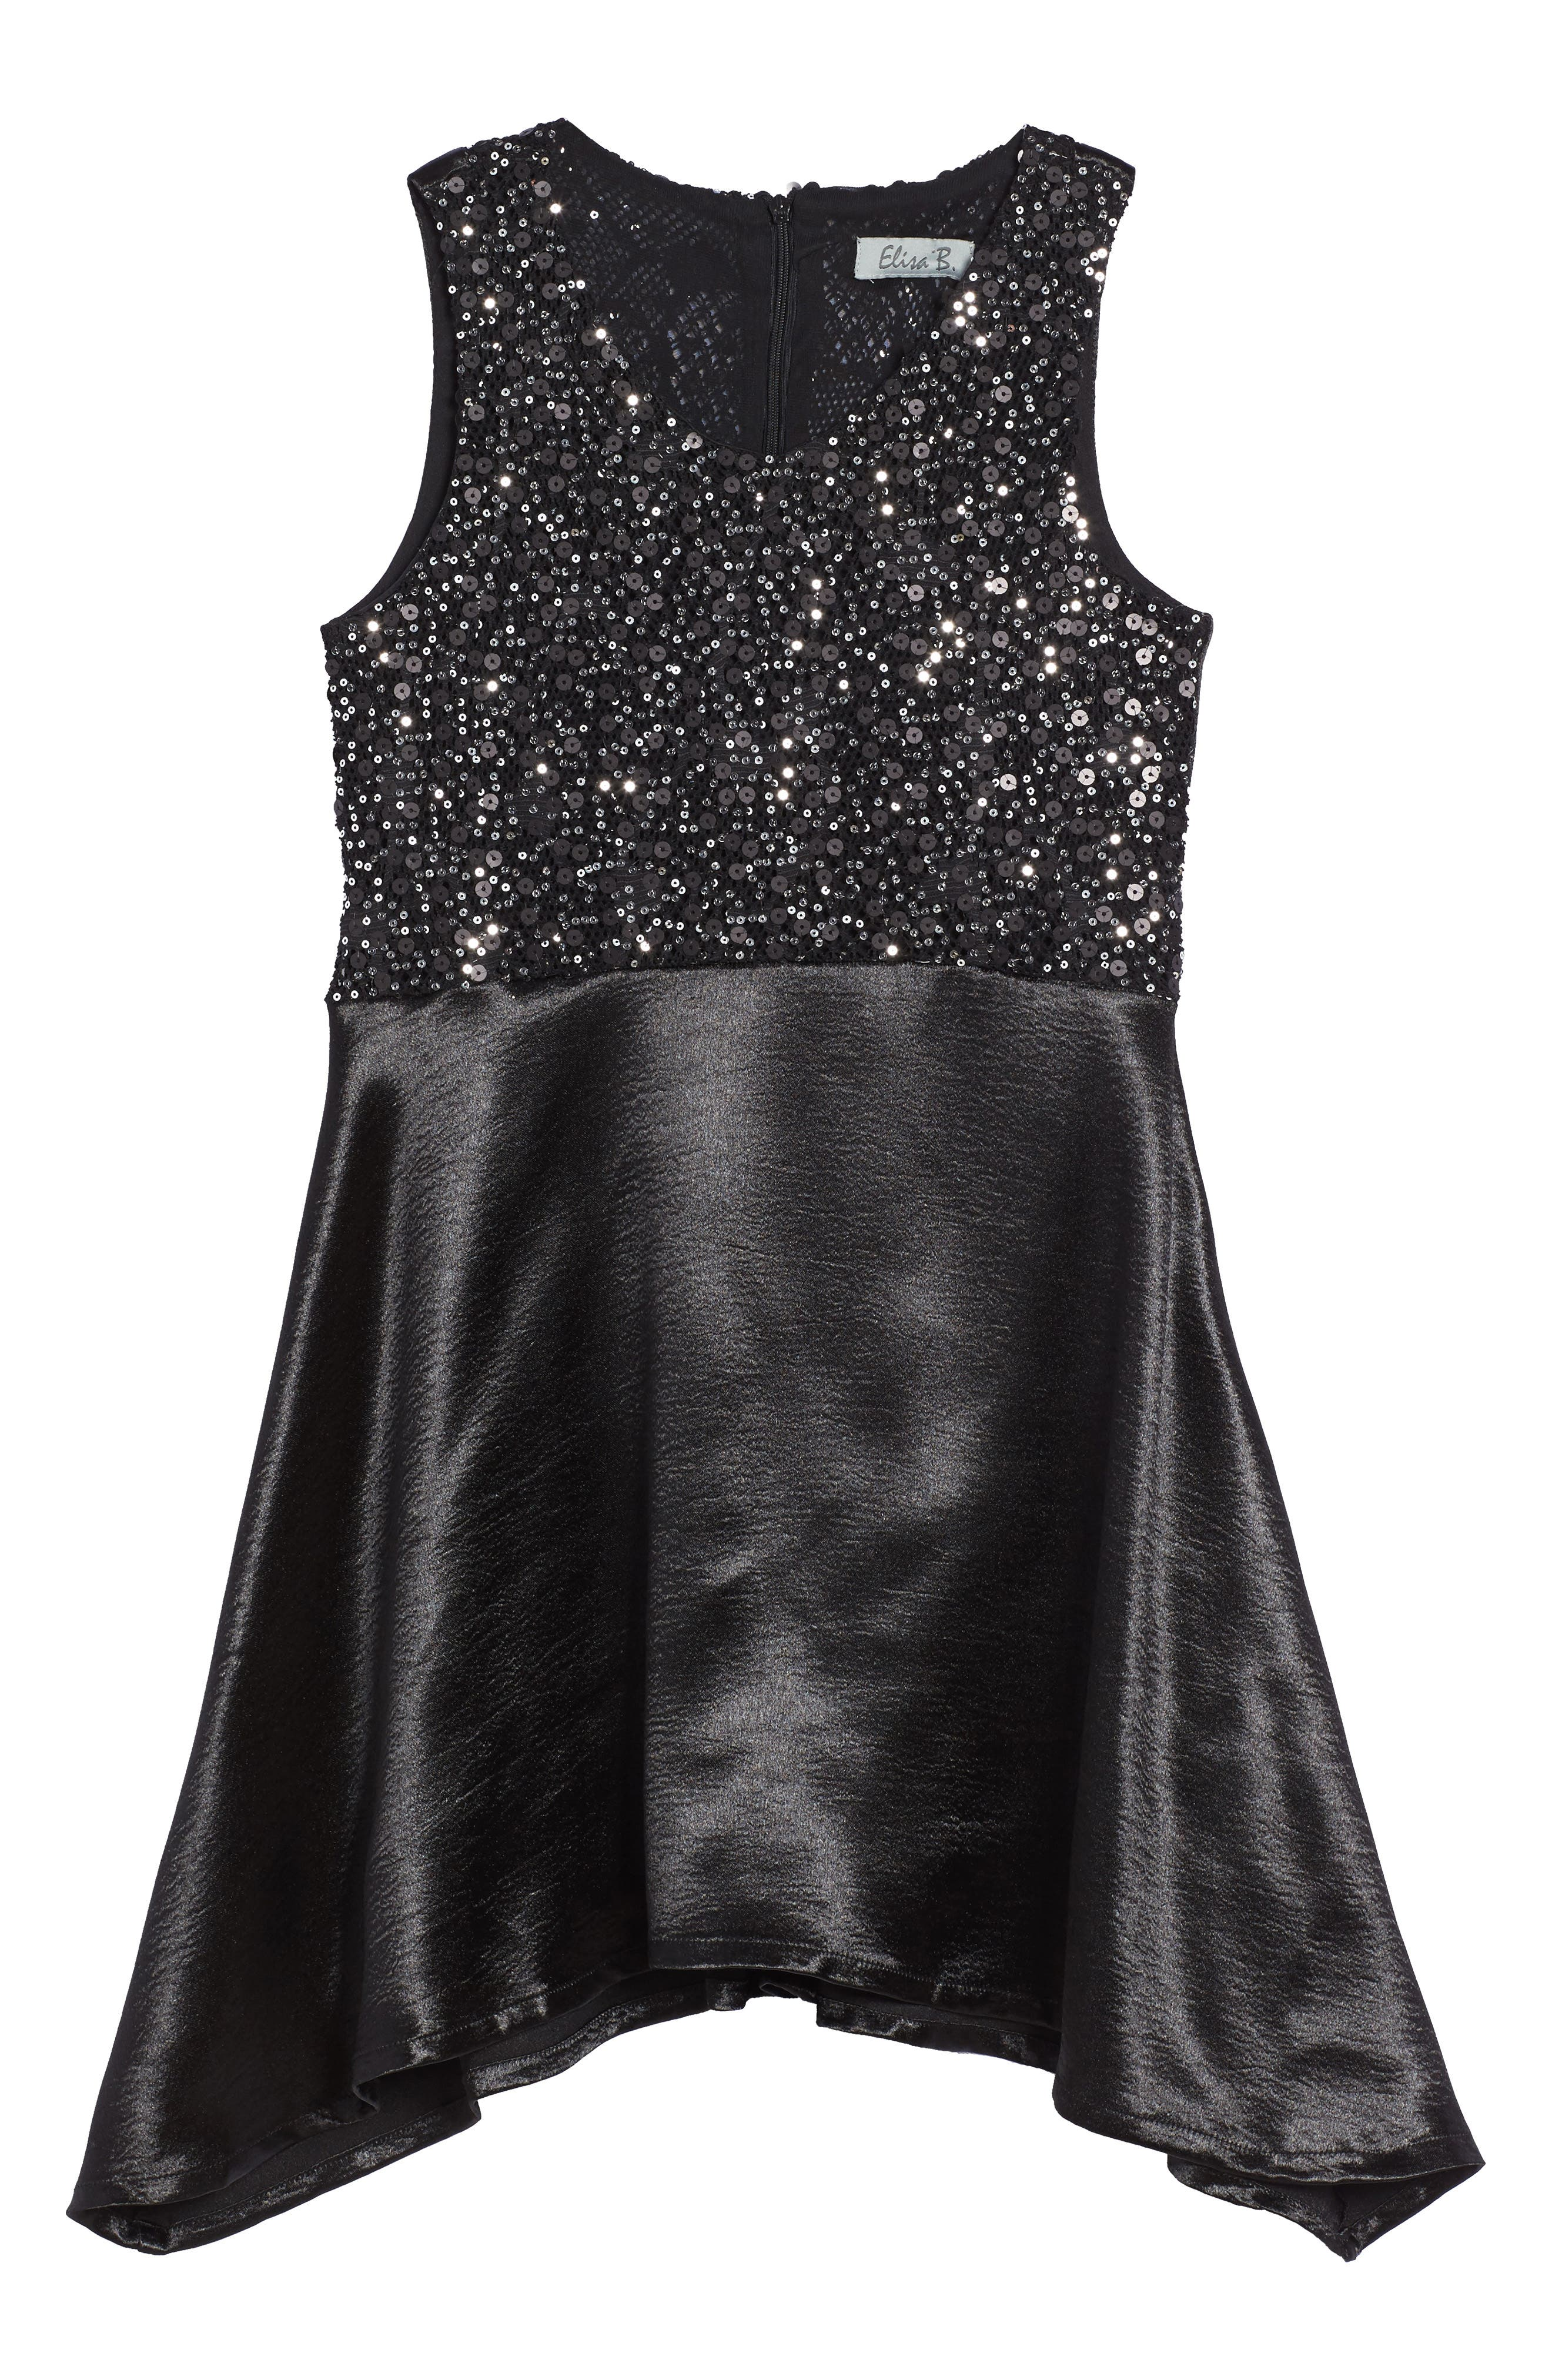 Elisa B Mixed Sequin Dress (Big Girls)